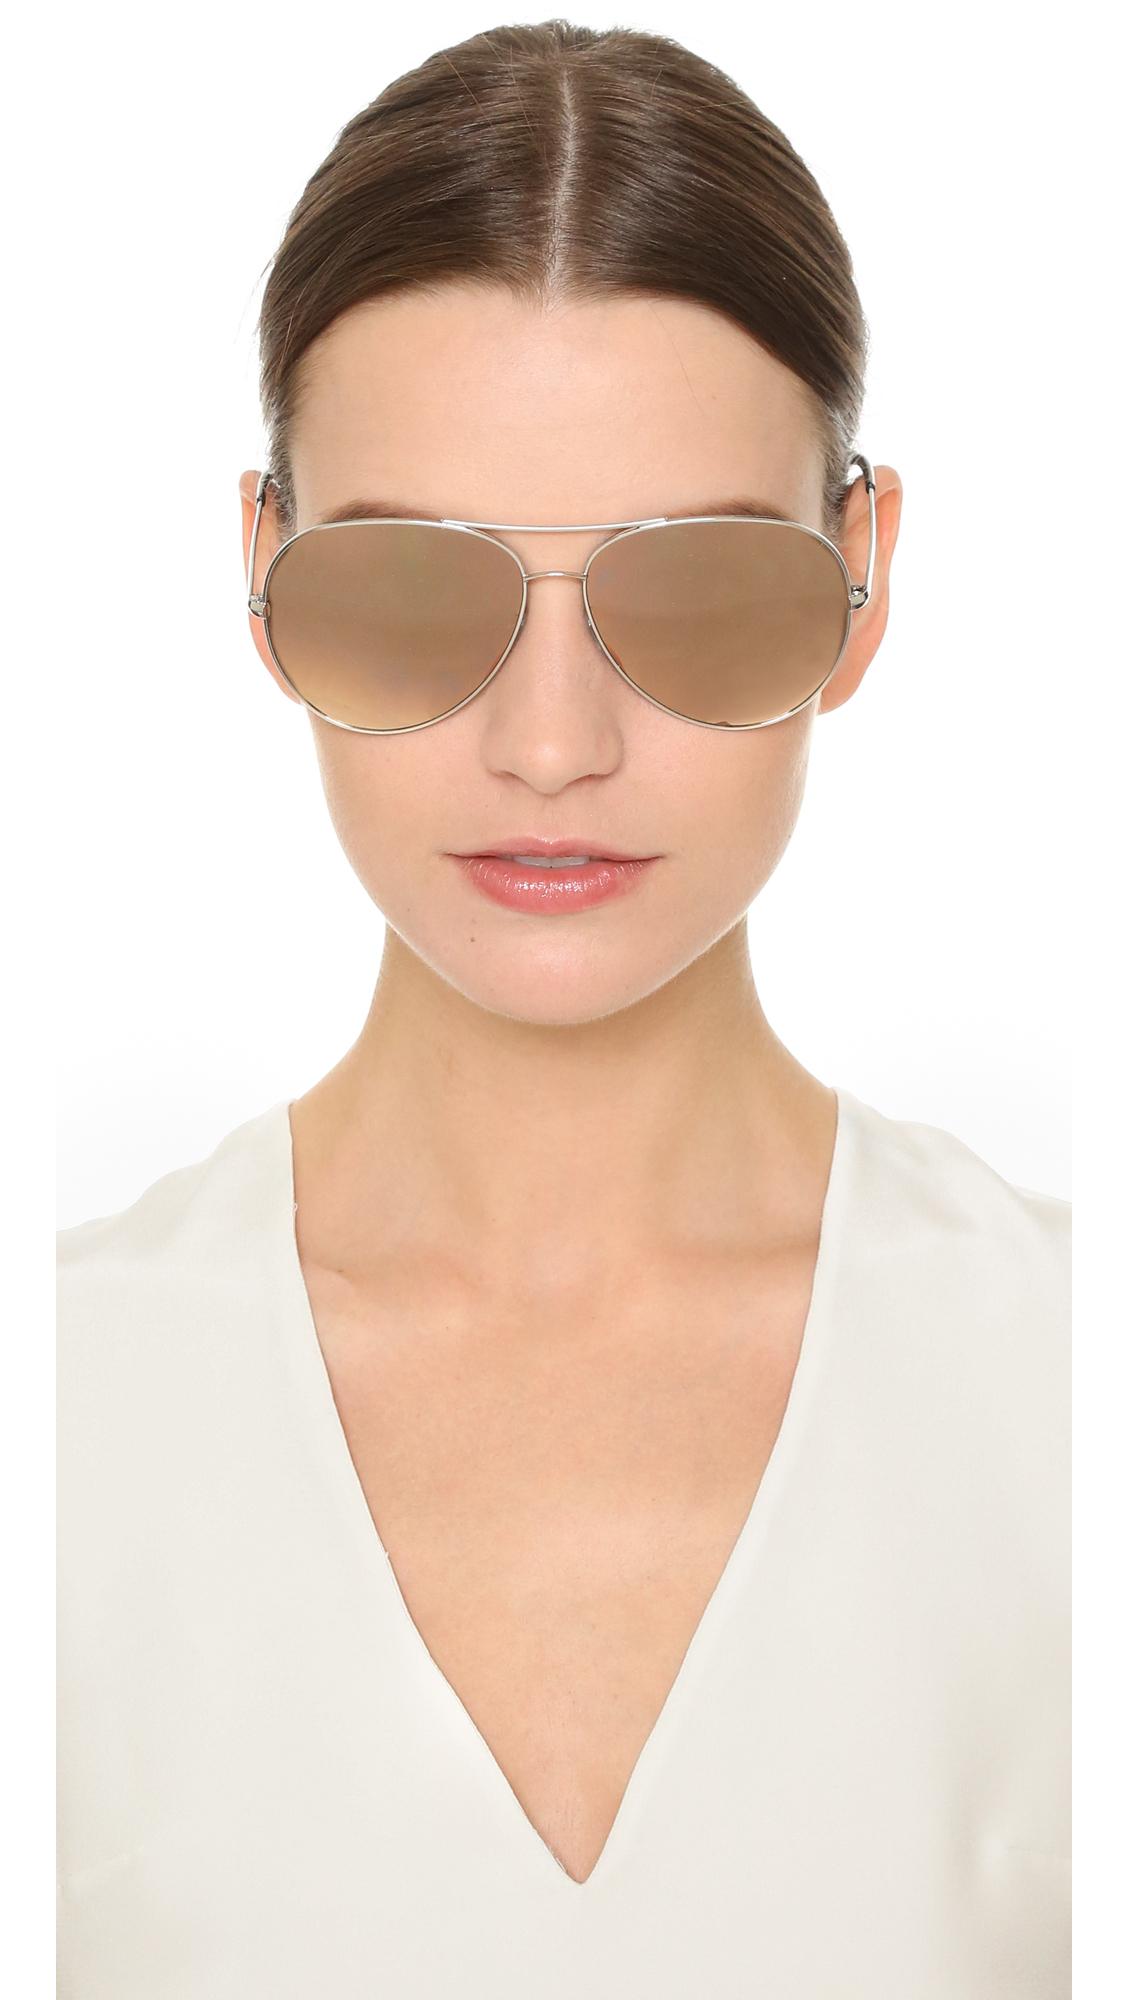 27b6f175c Oliver Peoples Sayer Sunglasses in Metallic - Lyst